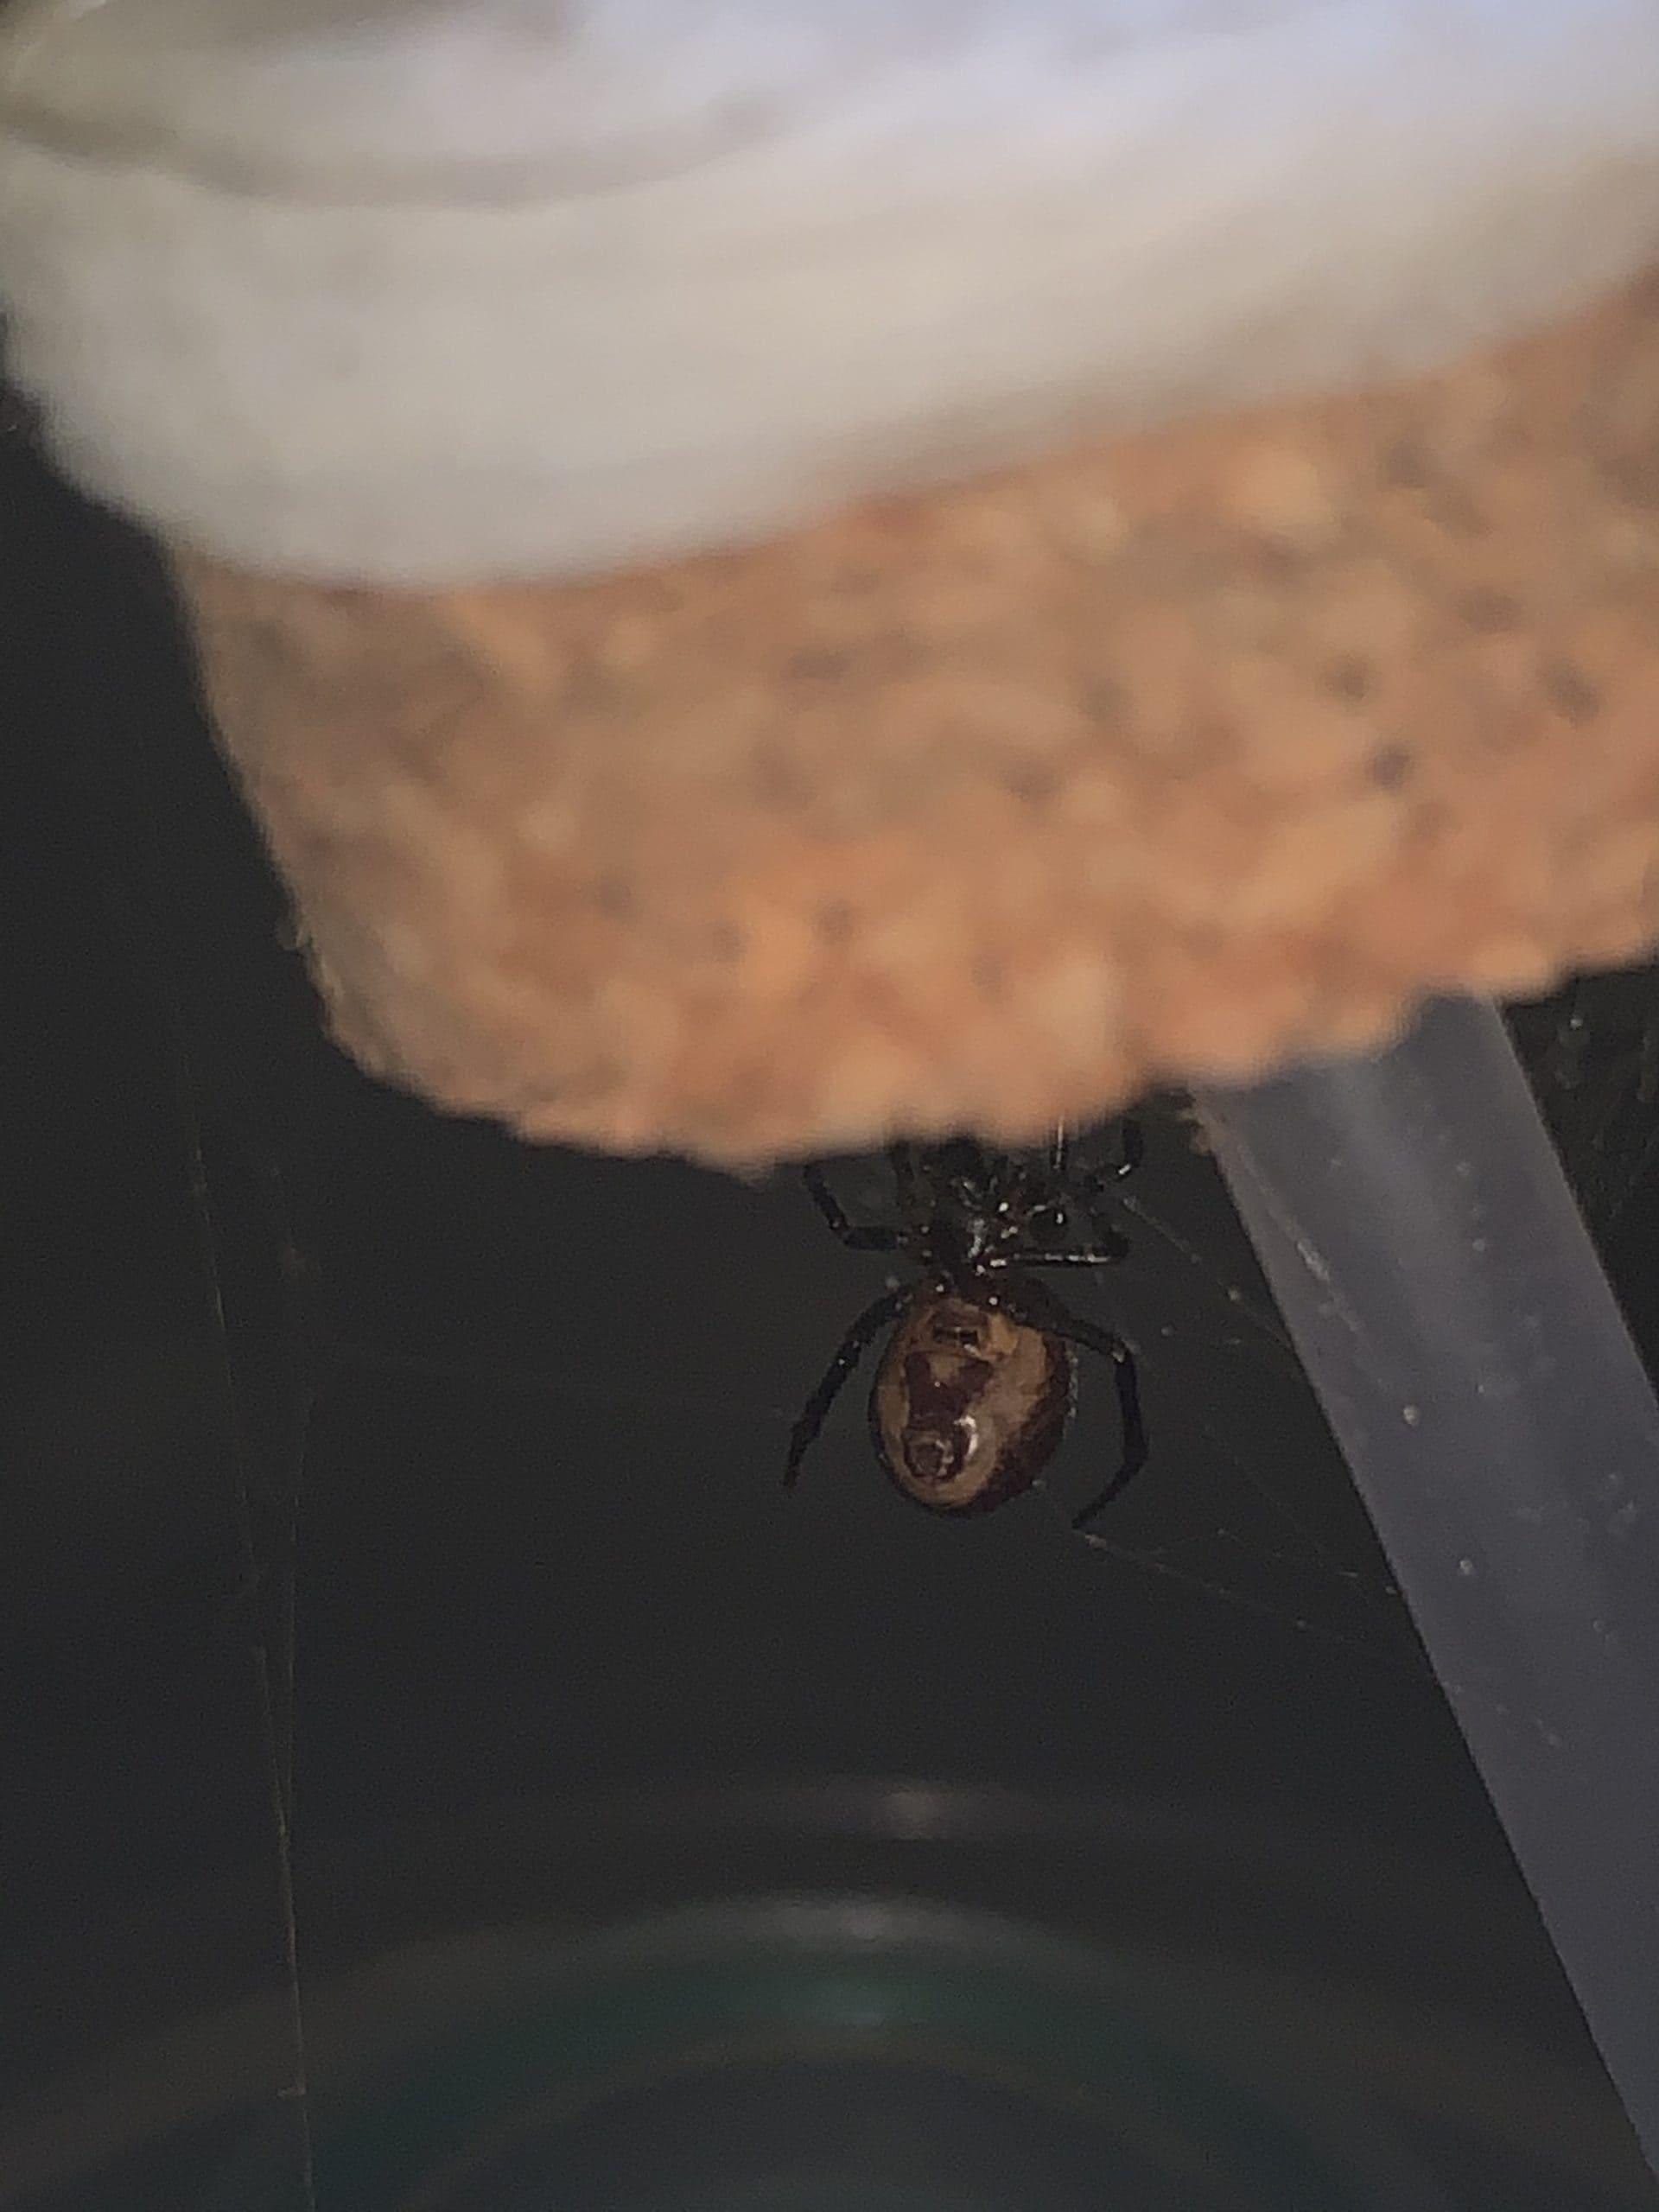 Picture of Steatoda (False Widows) - Female - Ventral